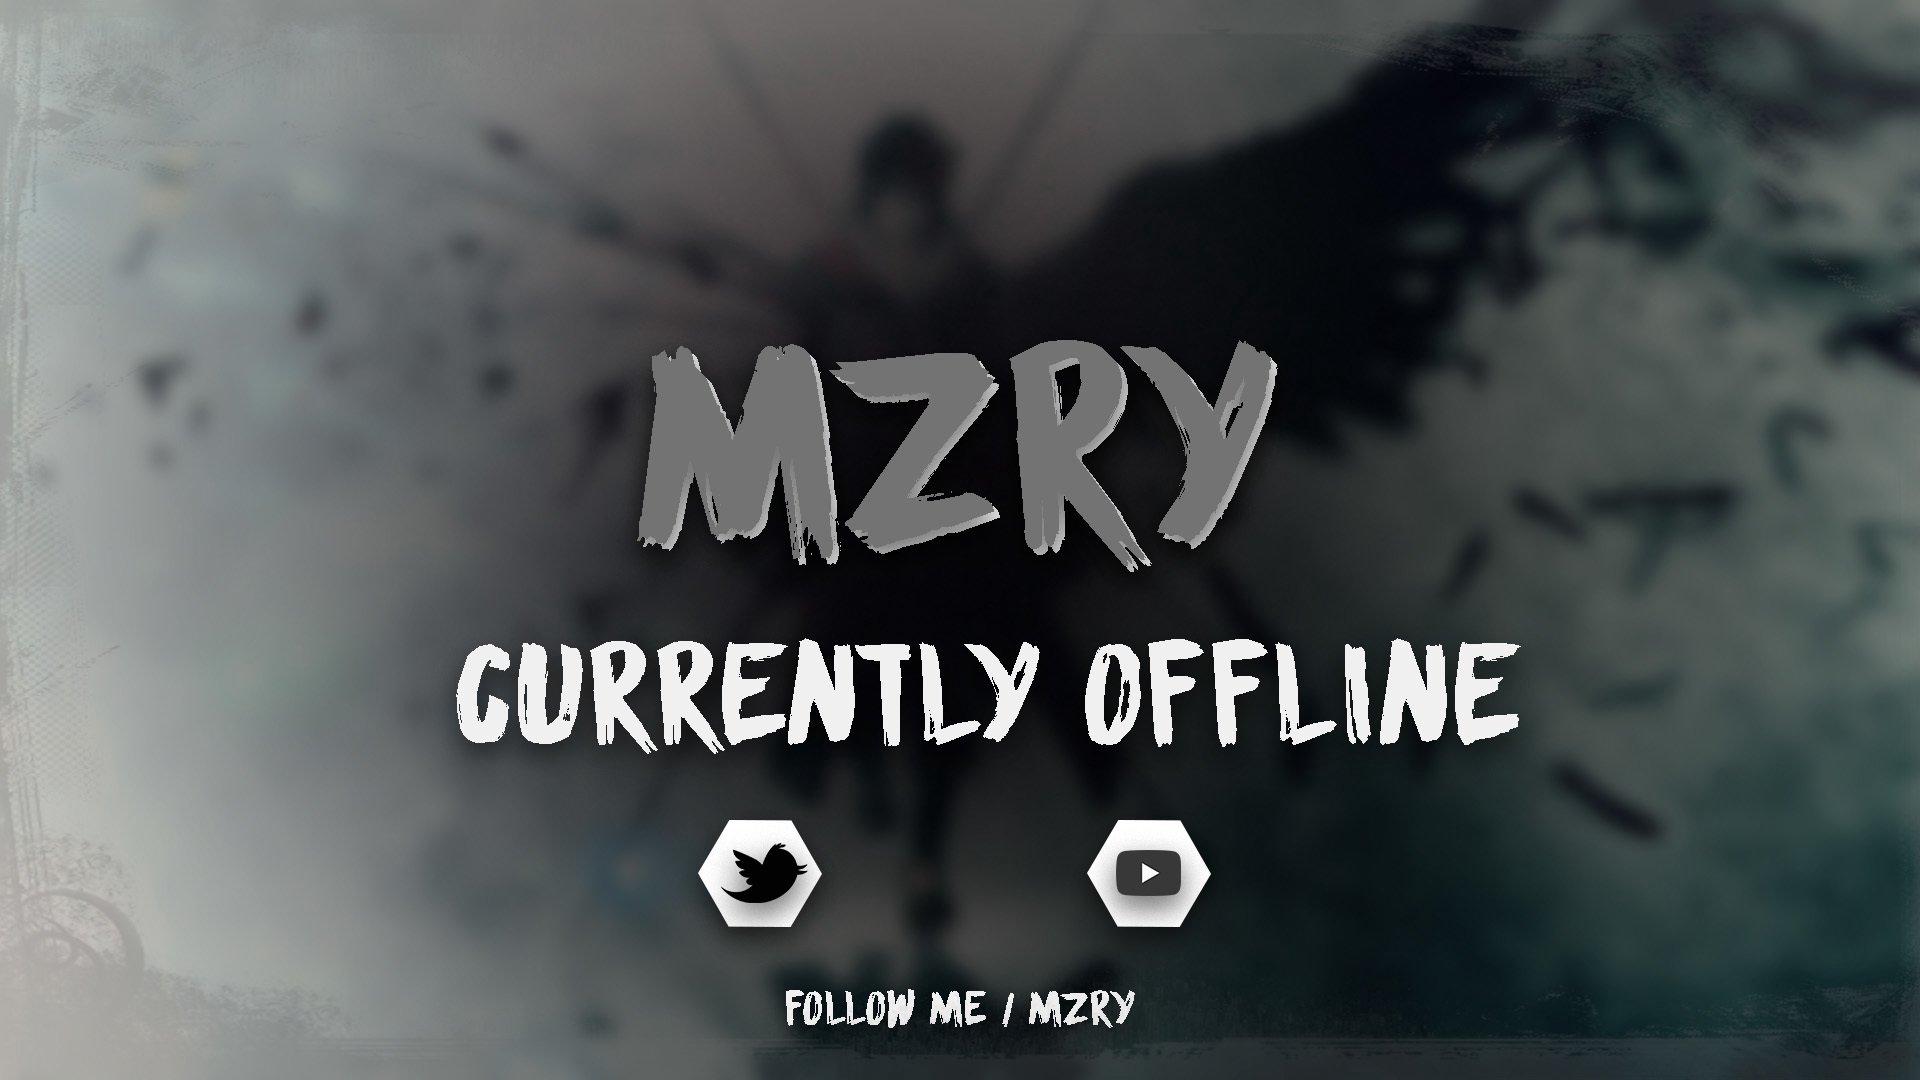 mzrry